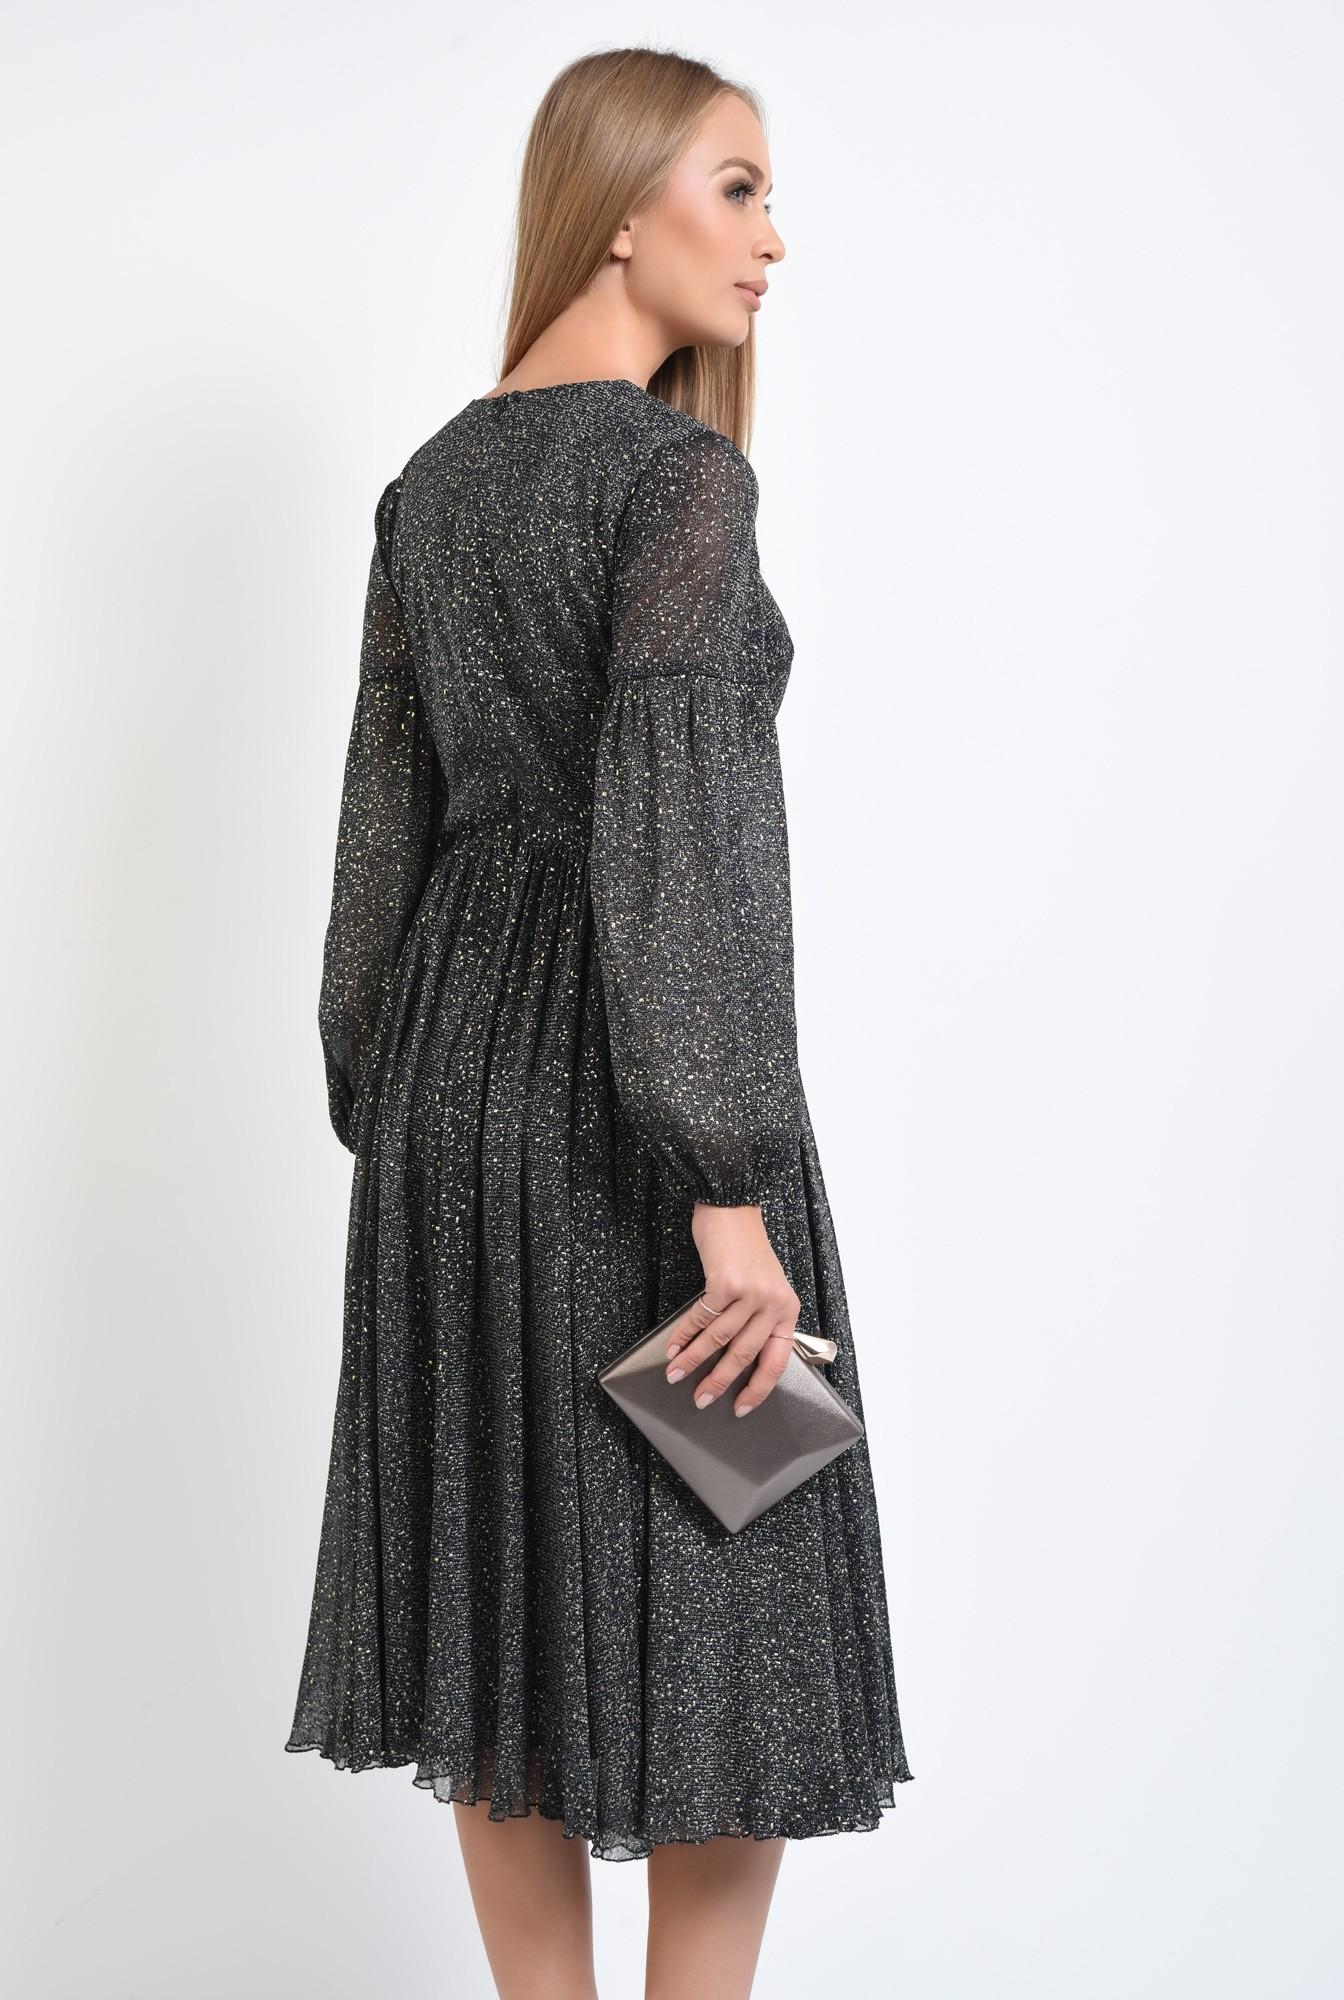 1 - rochie de seara, detalii aurii, rochii online, croi clos